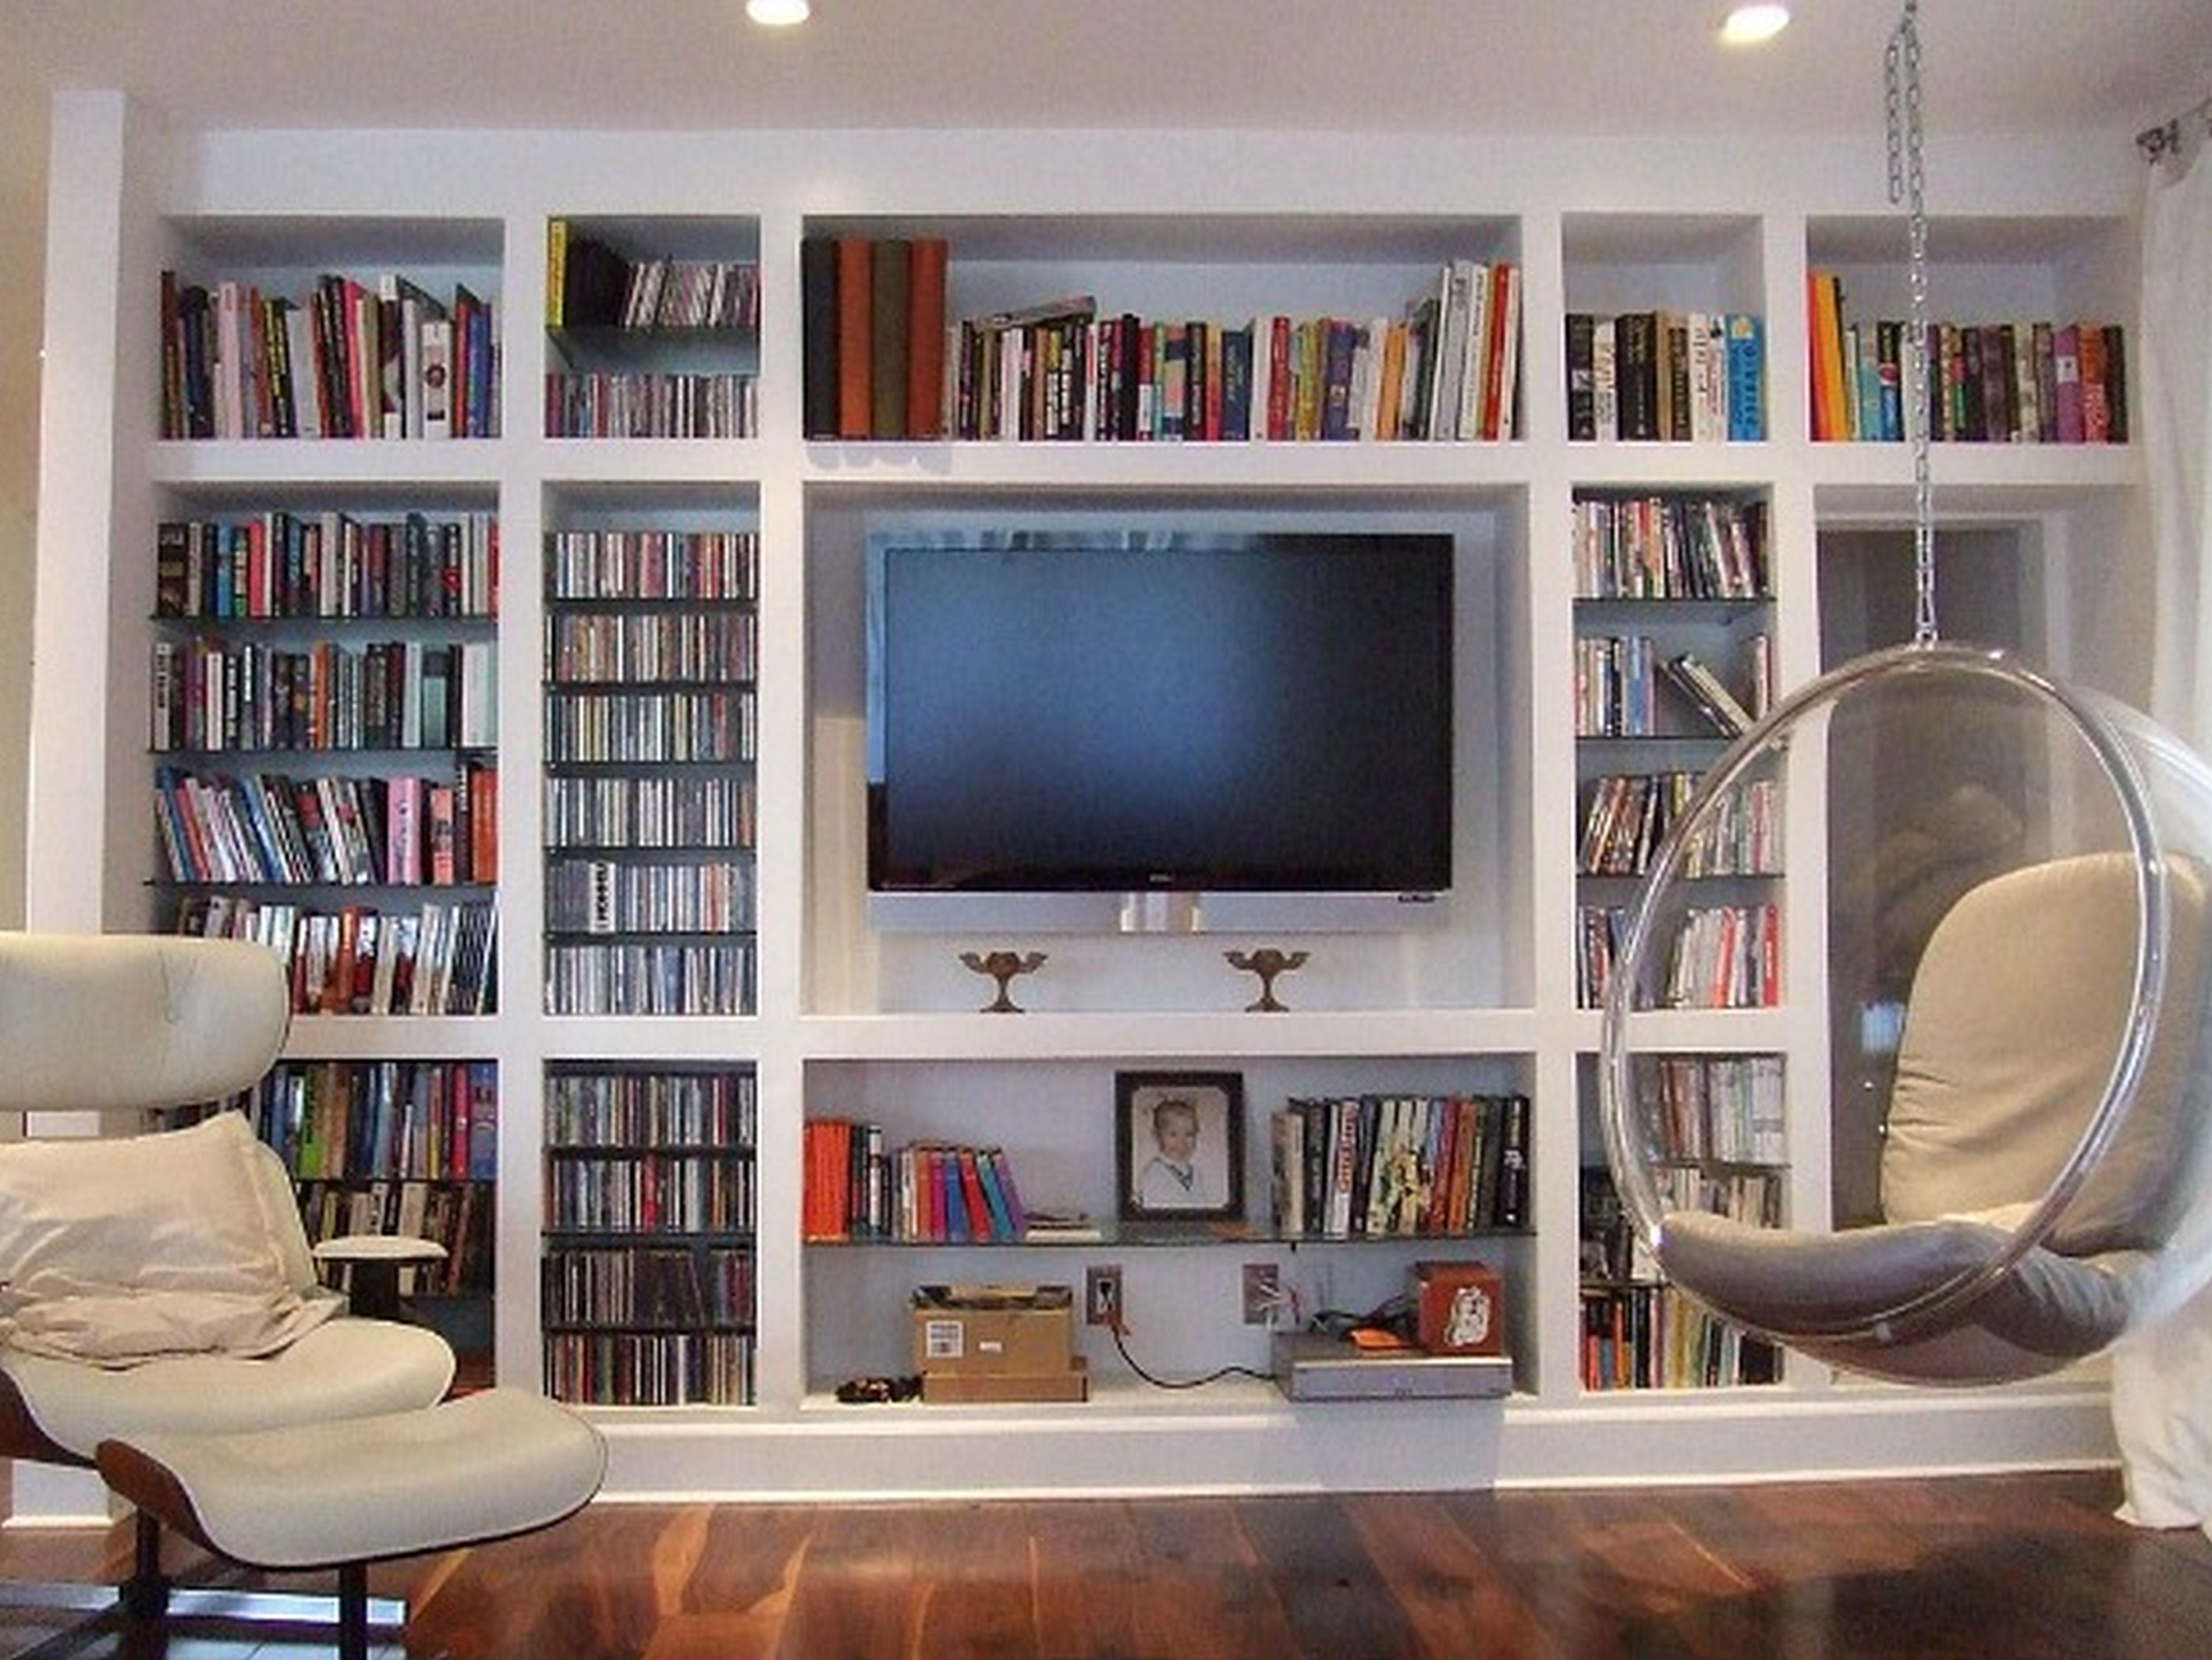 Wall Mount Bookshelf Unique Wall Mounted Bookshelves Wall Mounted Pertaining To Tv And Bookshelf (#15 of 15)